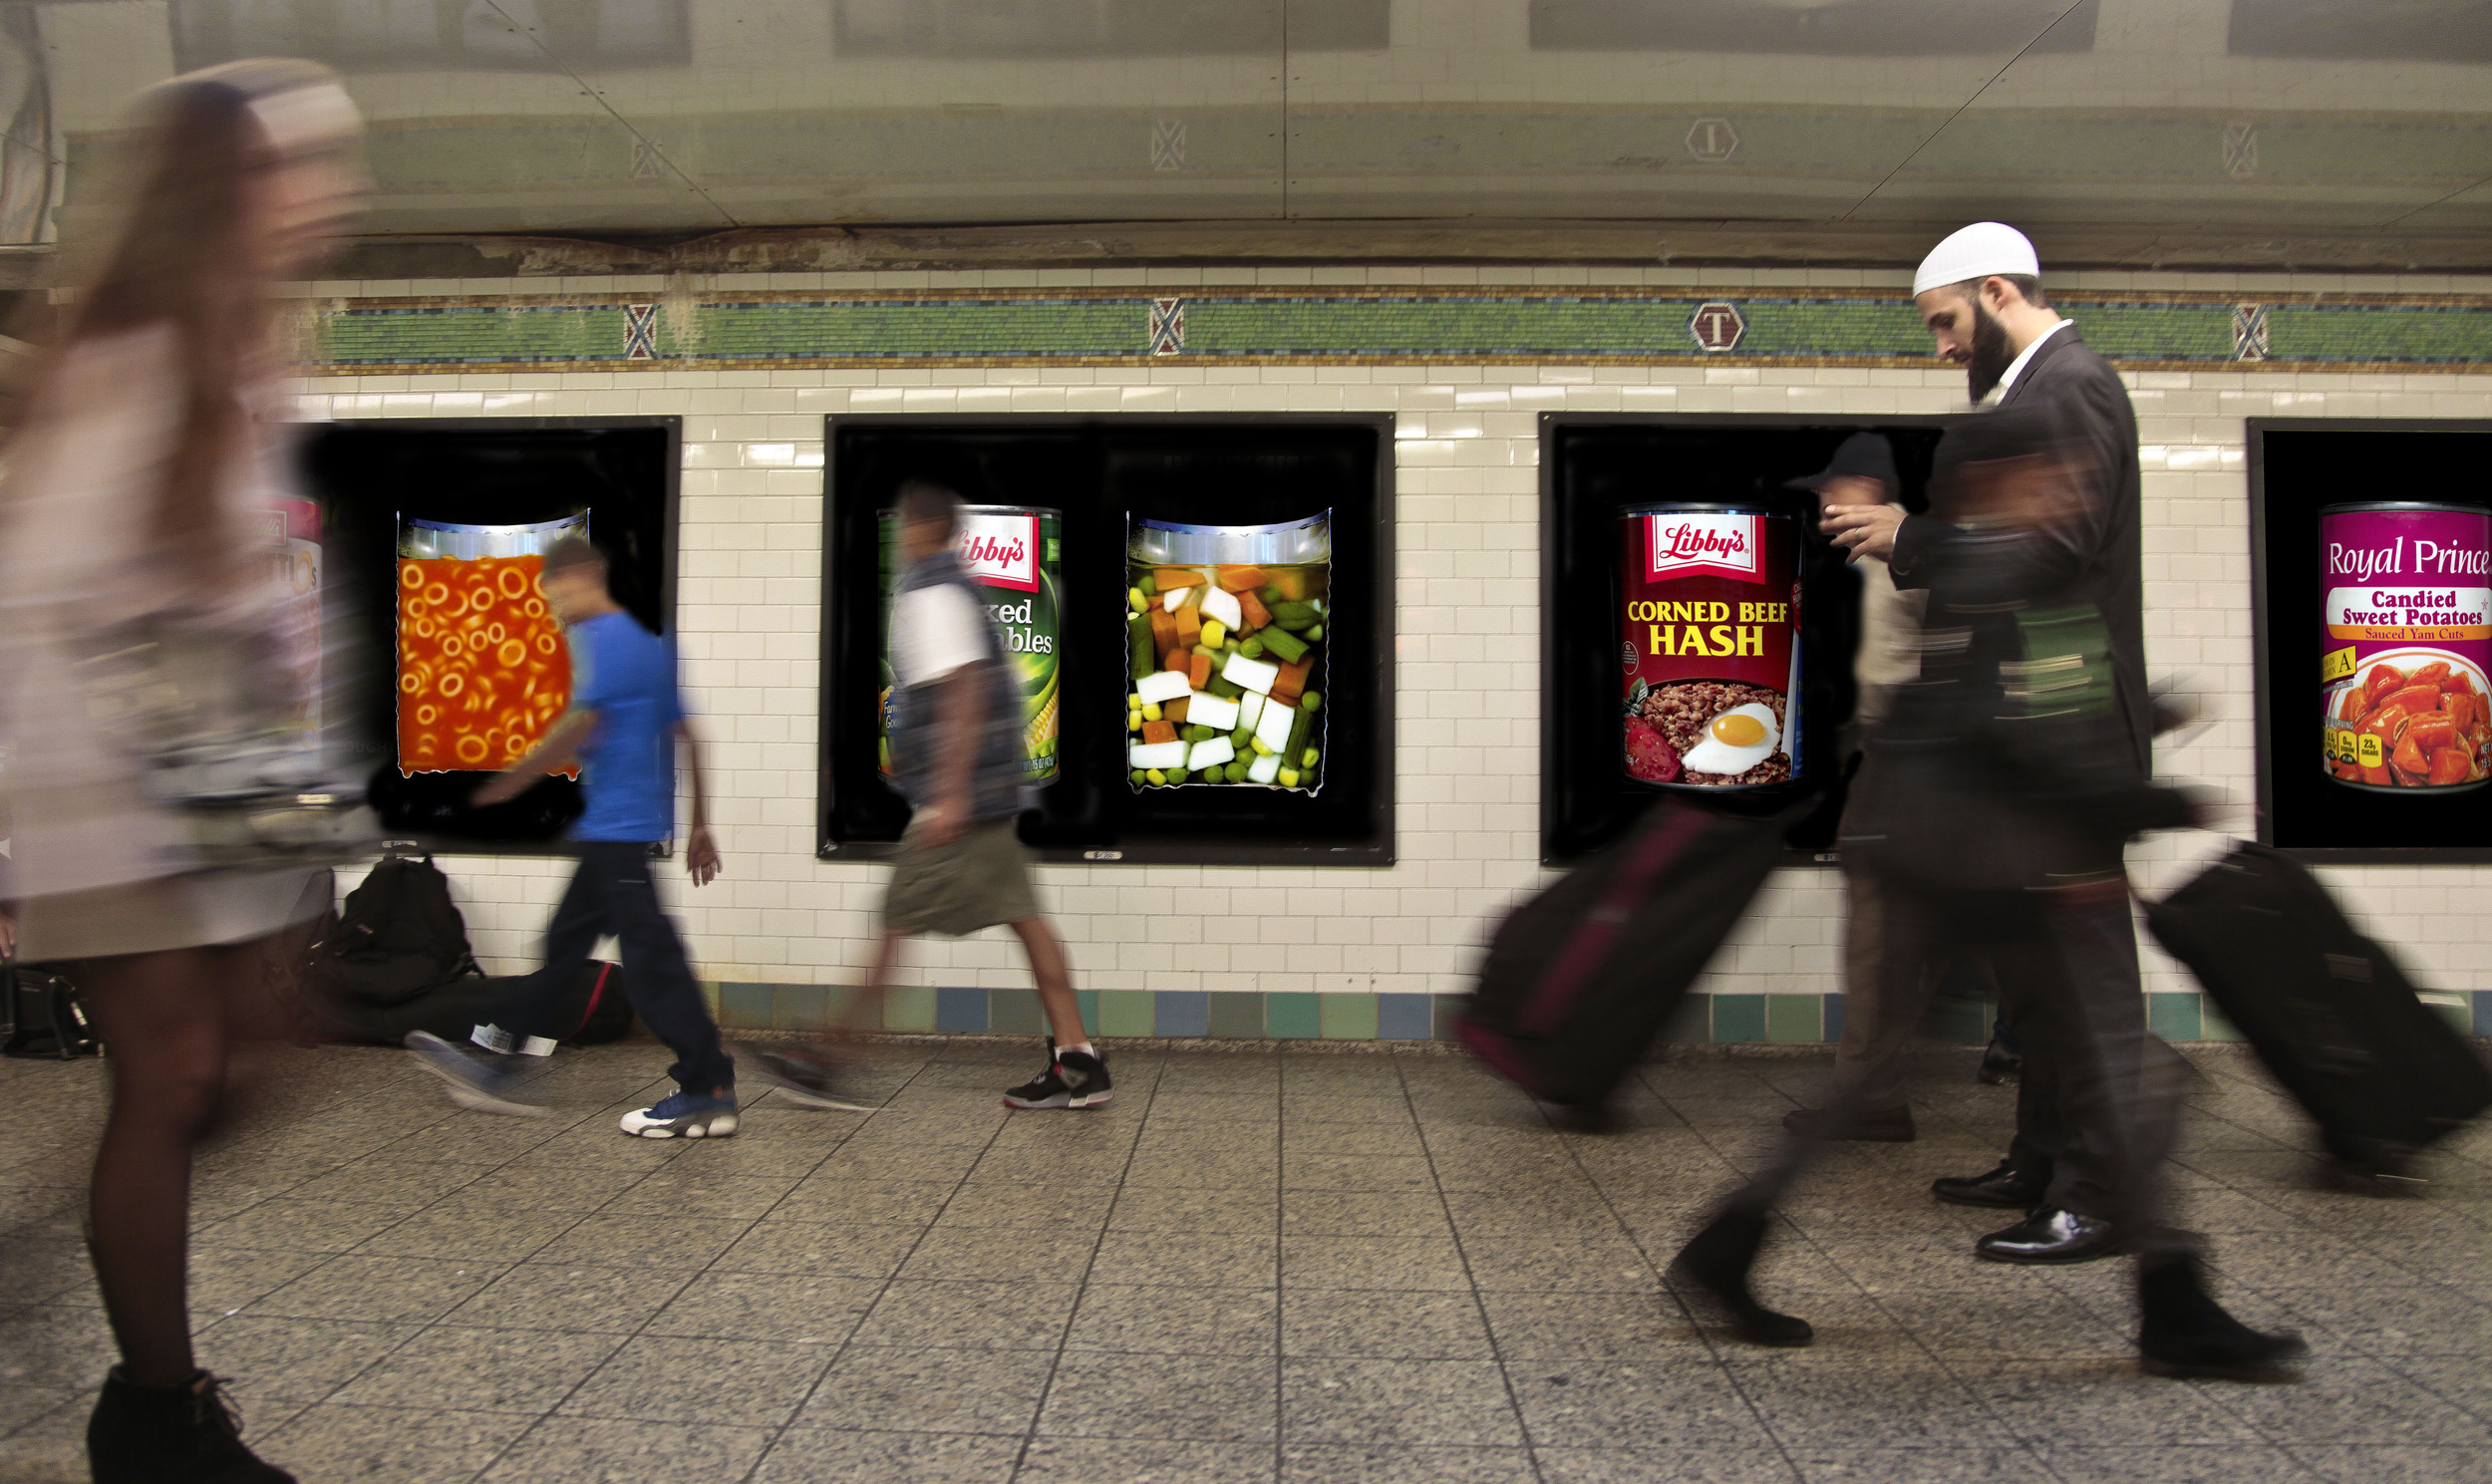 Subway-Ads-Jihad_sham MOCKUP.jpg